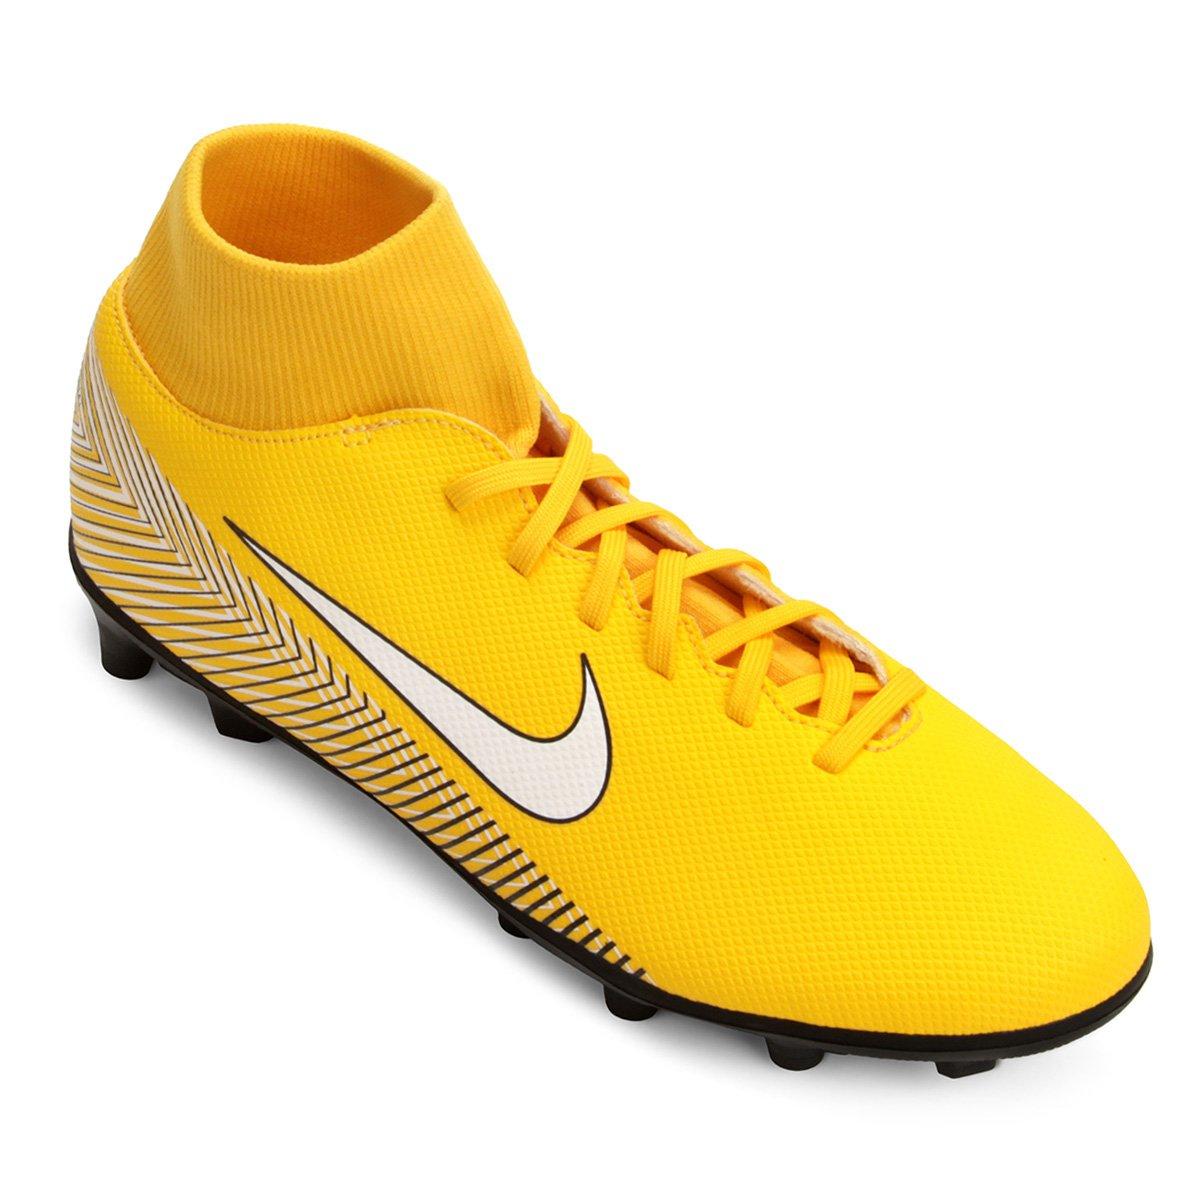 ebab14fb5e429 Chuteira Campo Nike Mercurial Superfly 6 Club Neymar FG - Amarelo e Preto |  Netshoes